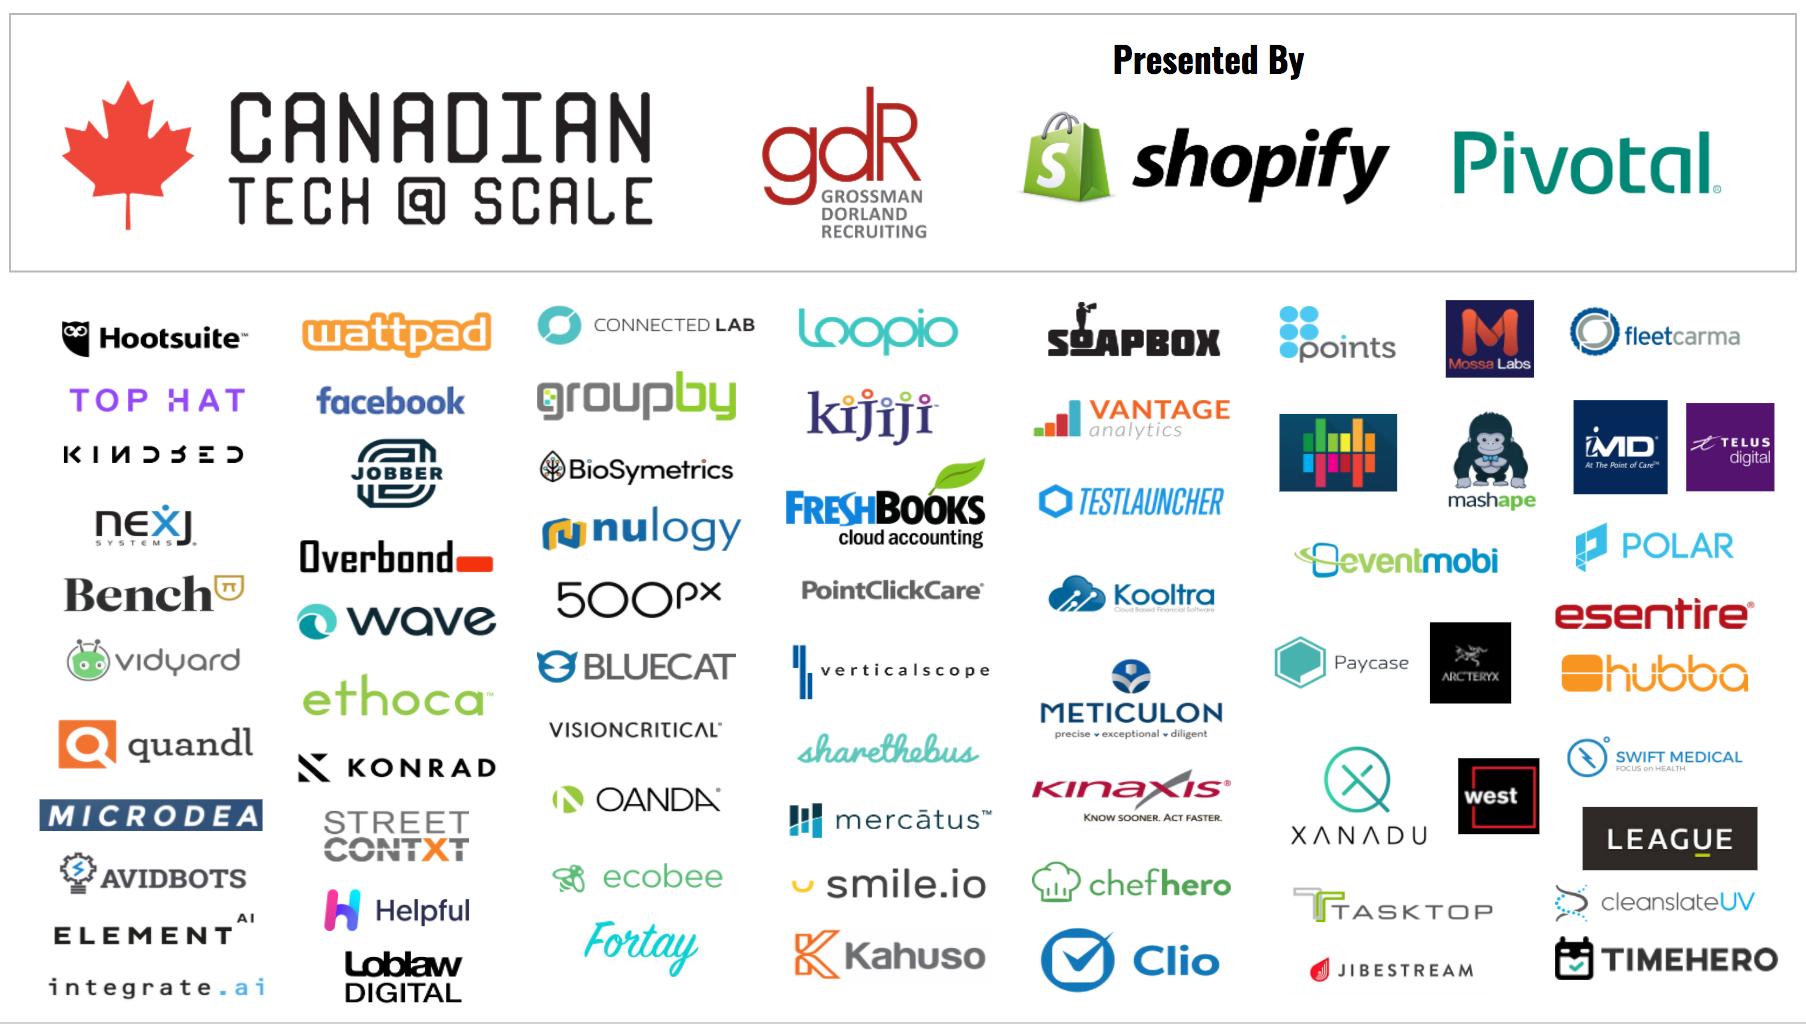 Companies at #cdnTECHatSCALE 2017